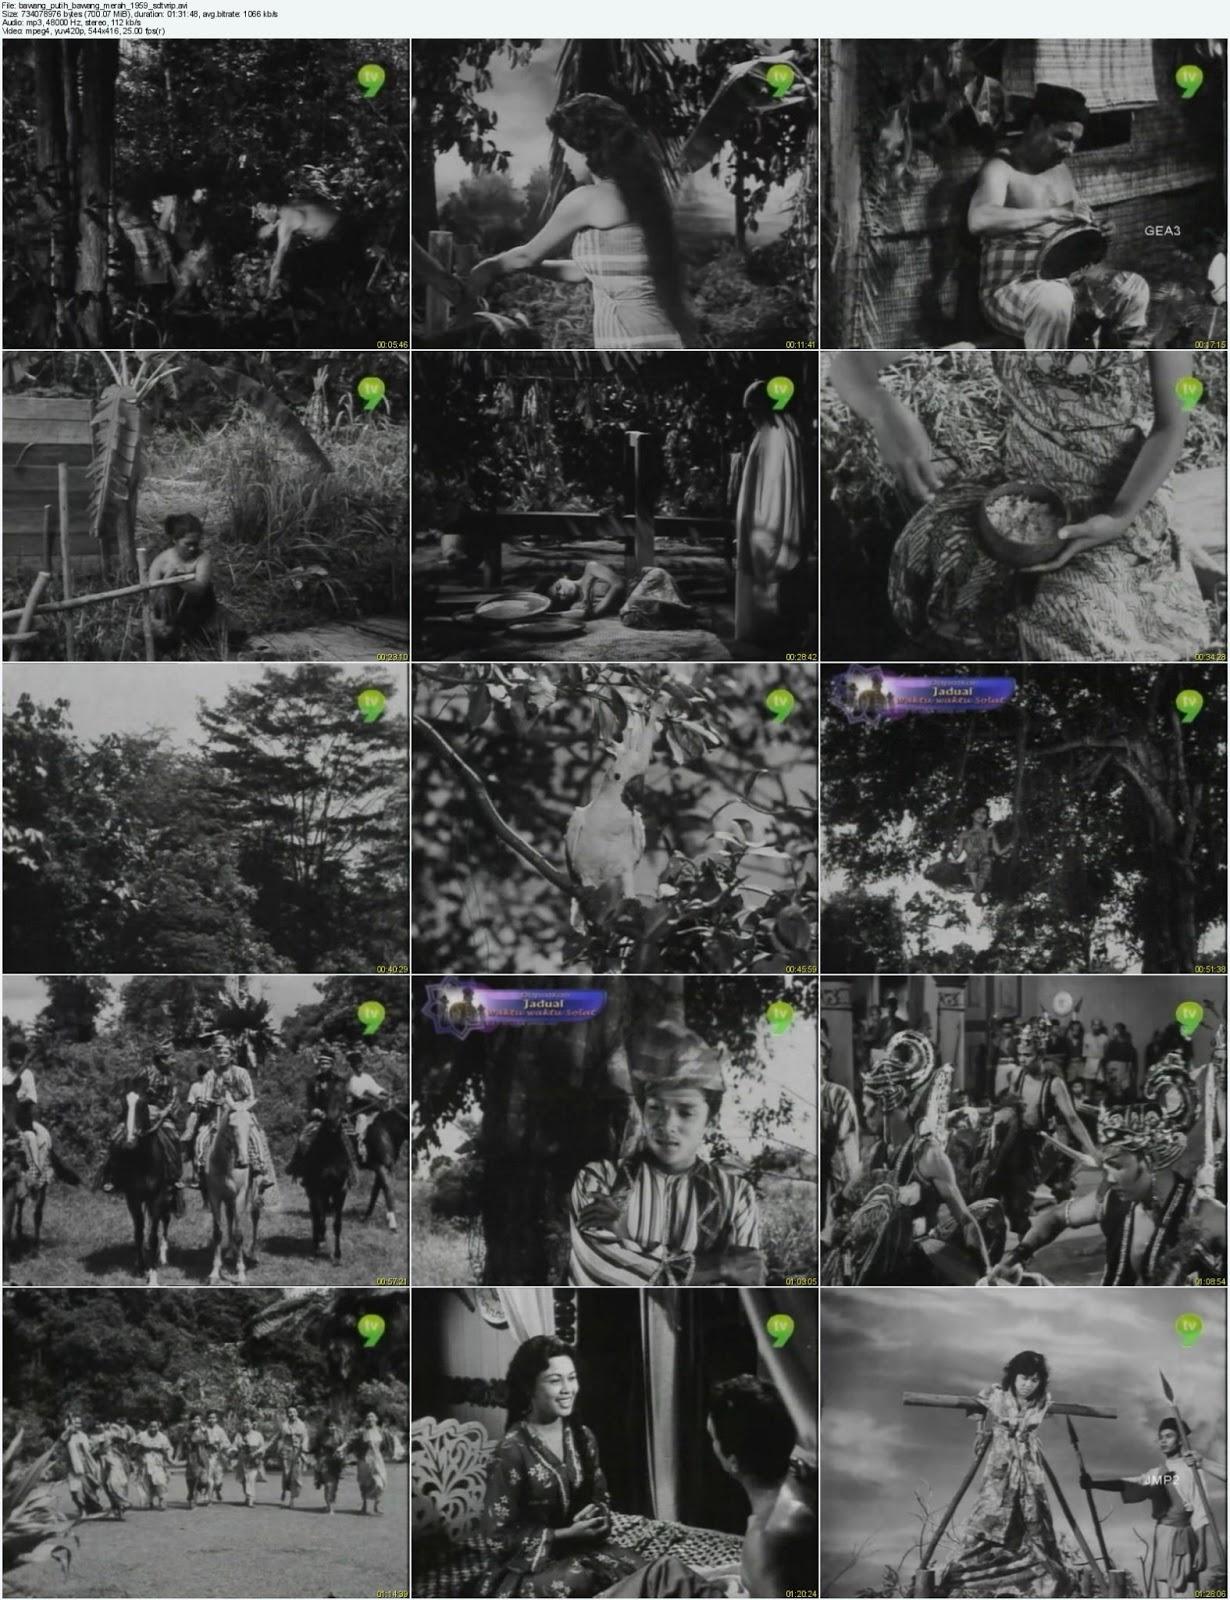 Bawang Merah Bawang Putih Sinetron http://www.crazyscreen.biz/2013/06